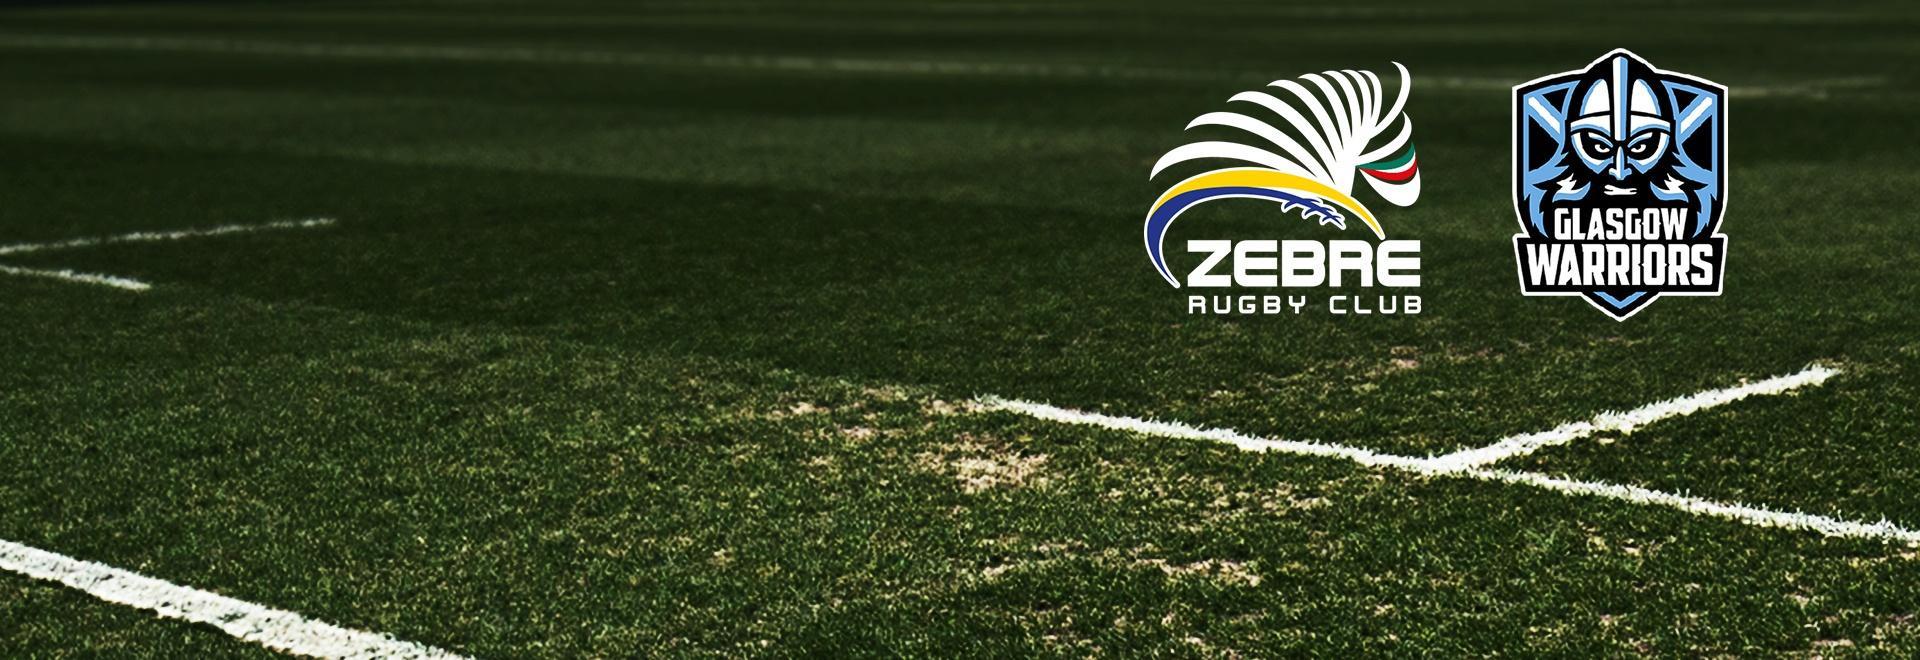 Zebre - Glasgow Warriors